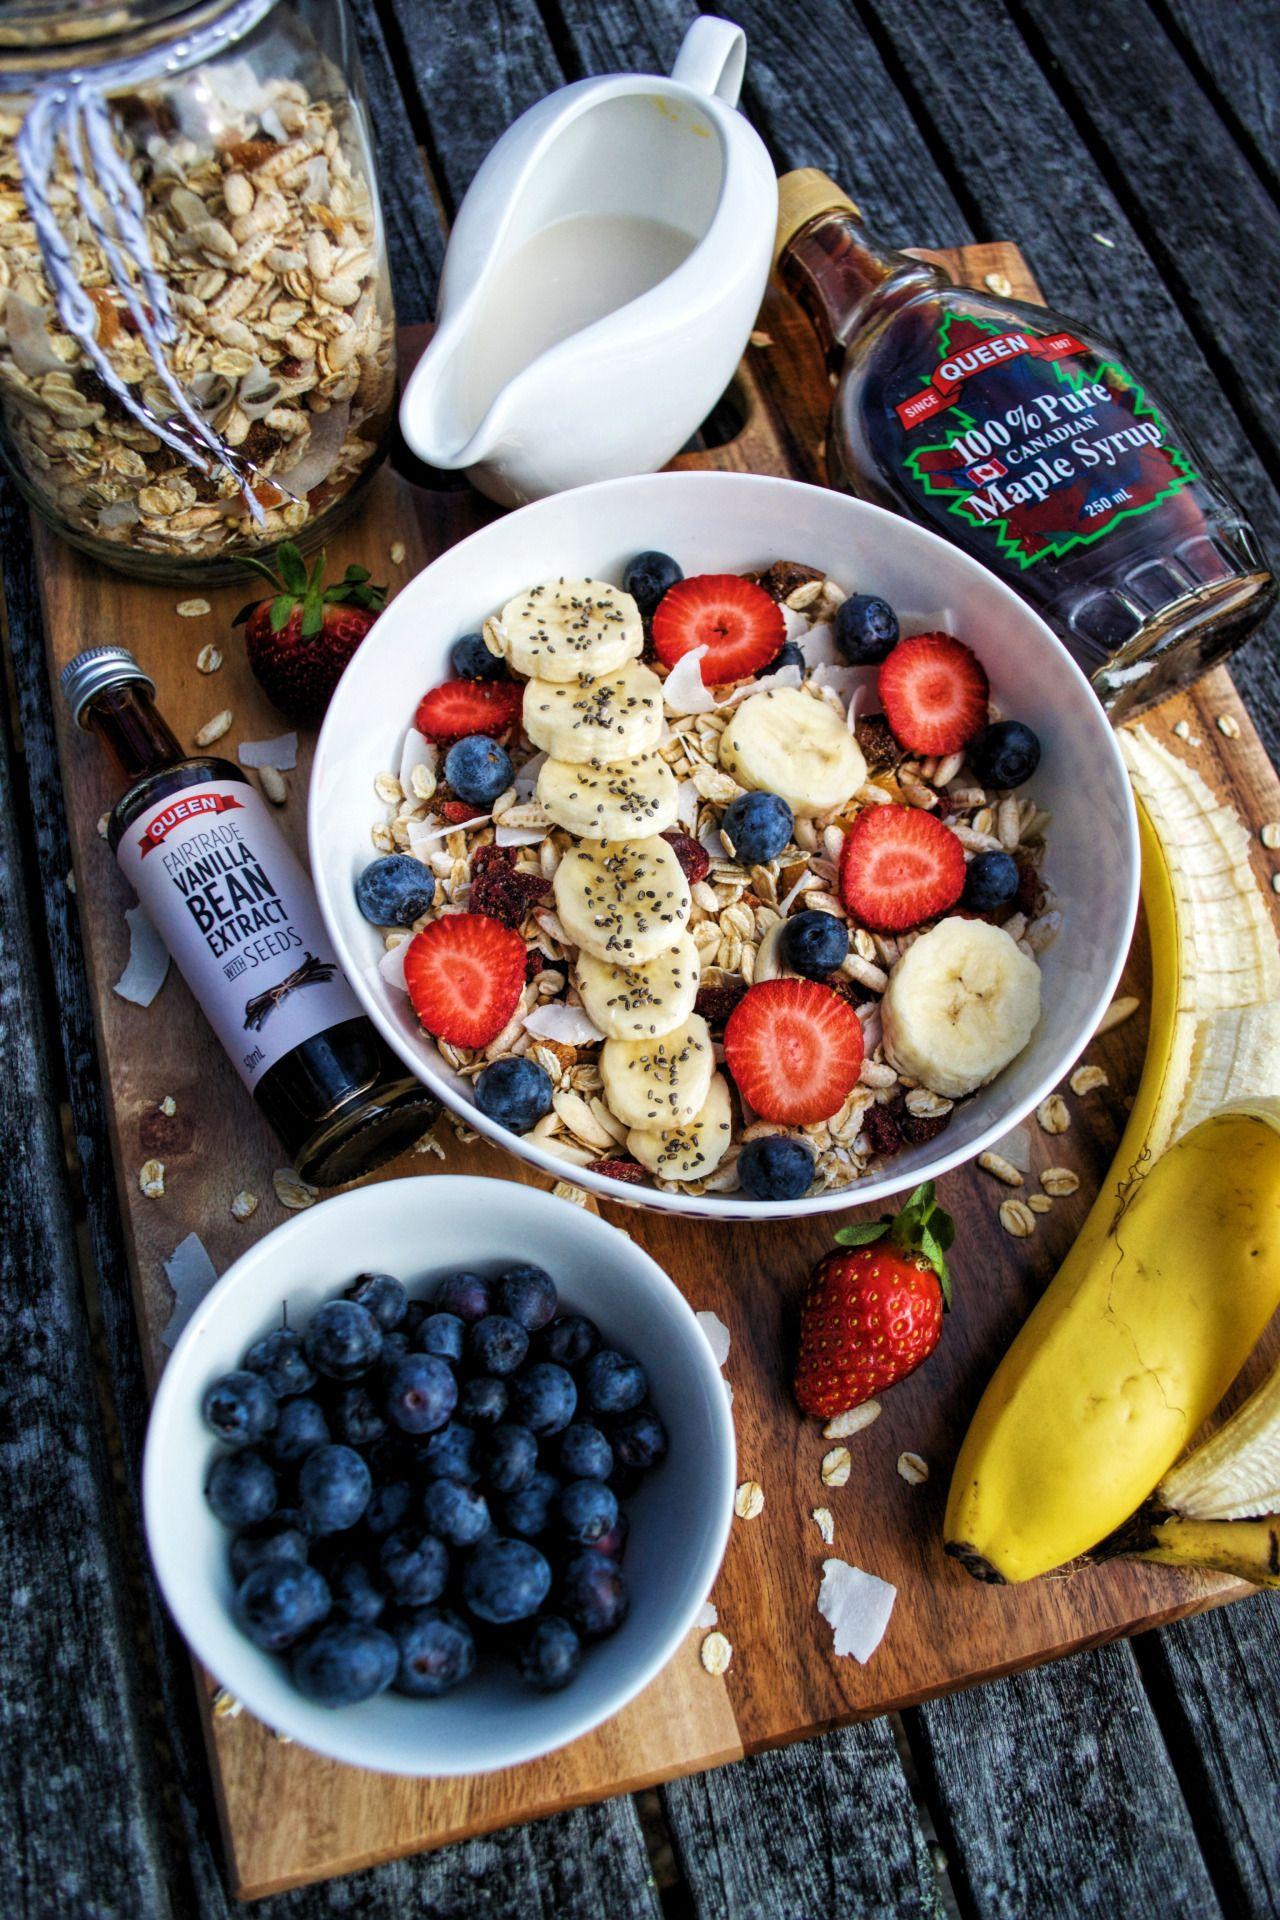 Homemade vegan muesli for the recipe add my snapchat earthlyella homemade vegan muesli for the recipe add my snapchat earthlyella instagram forumfinder Choice Image